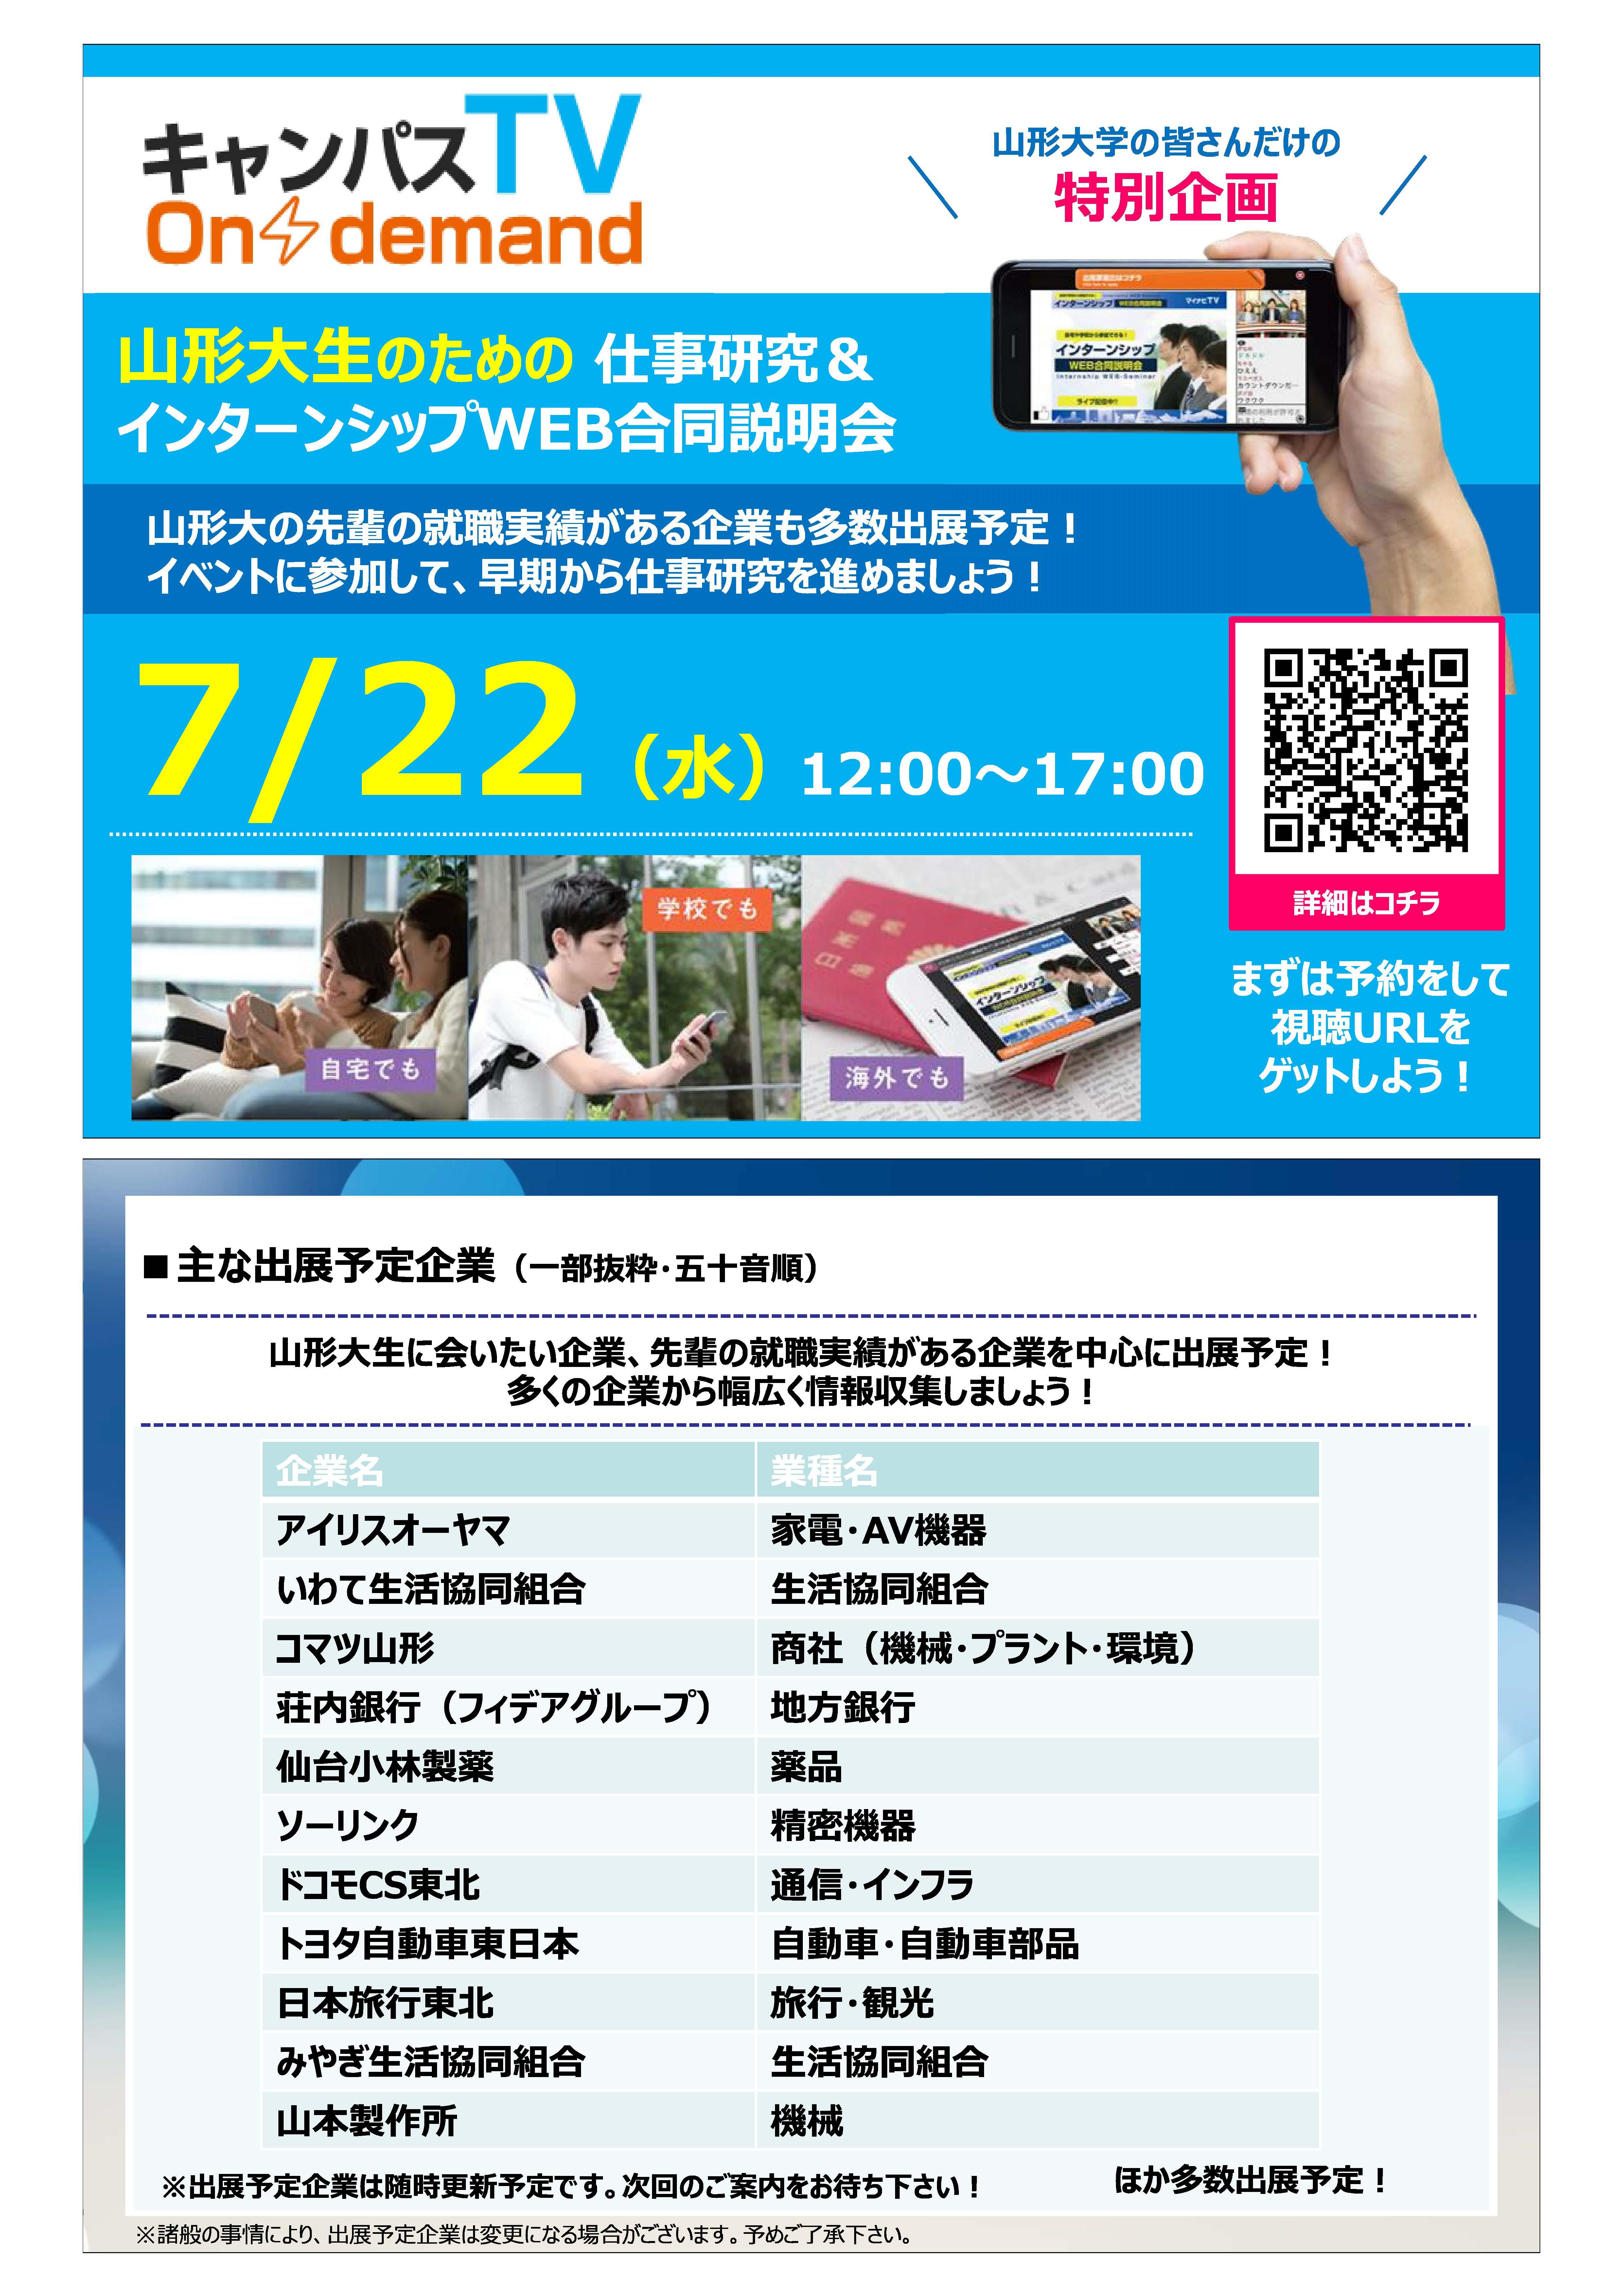 【出展予定企業一覧】7月22日山形大学WEBイベント(7月3日更新分) .jpg